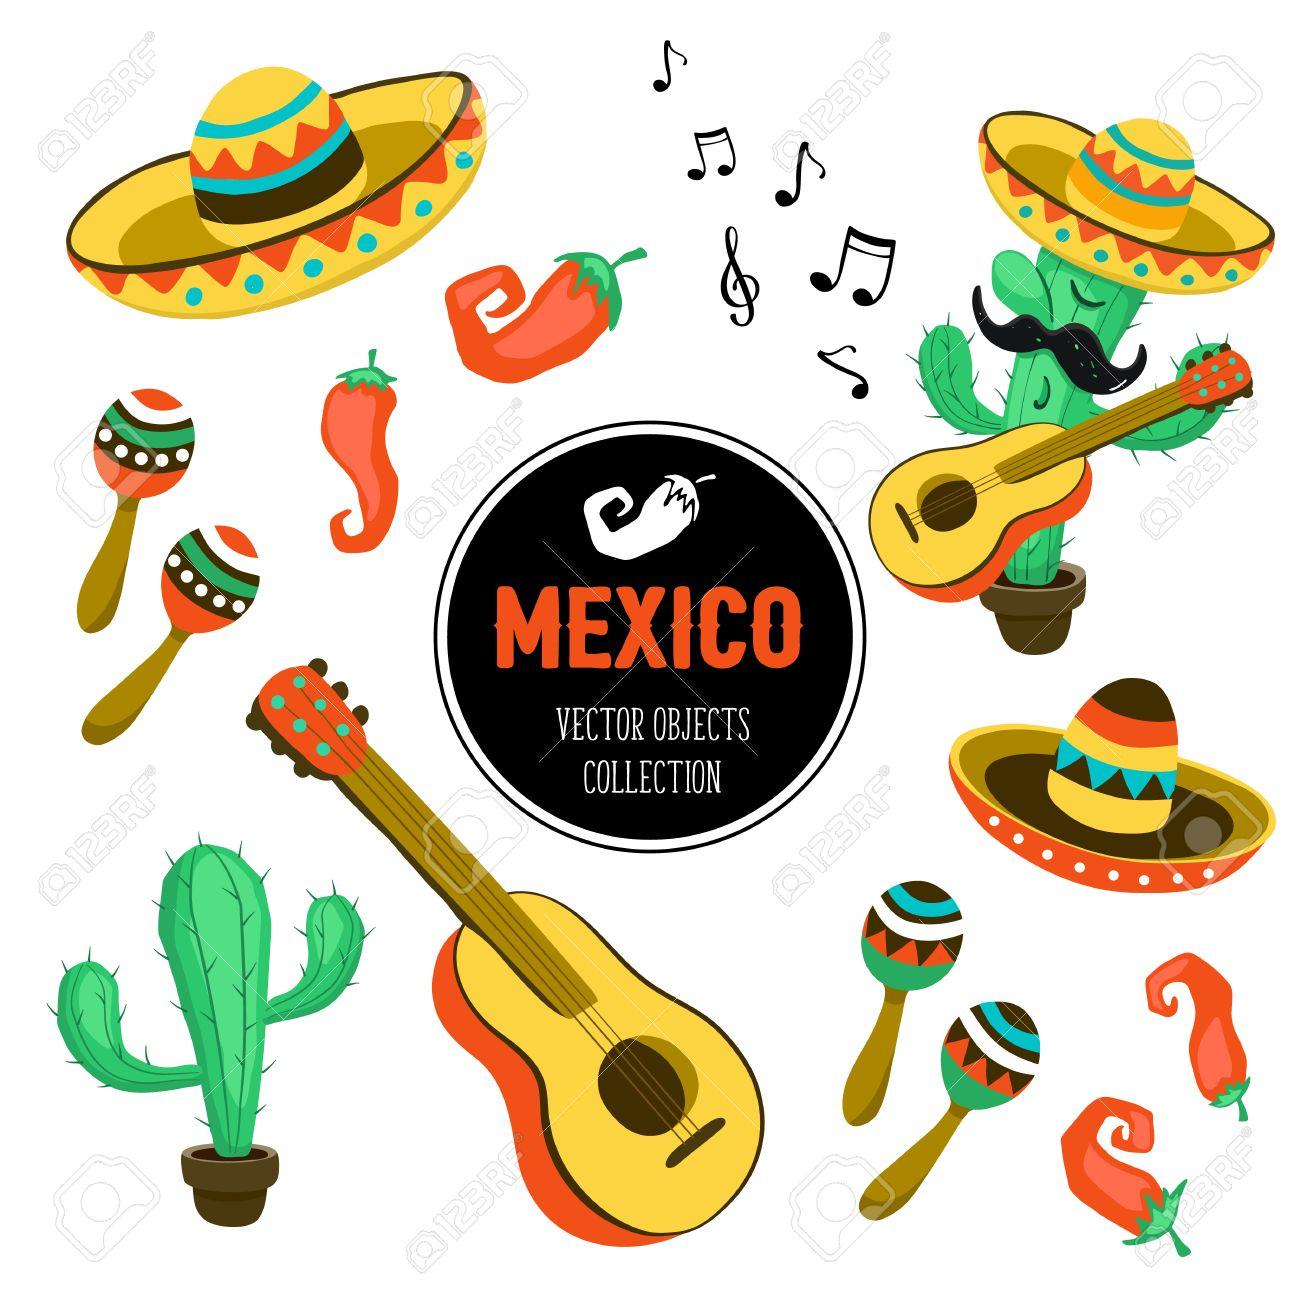 1300x1300 Mexican Culture Attributes Collection. Guitar 0a64317eada